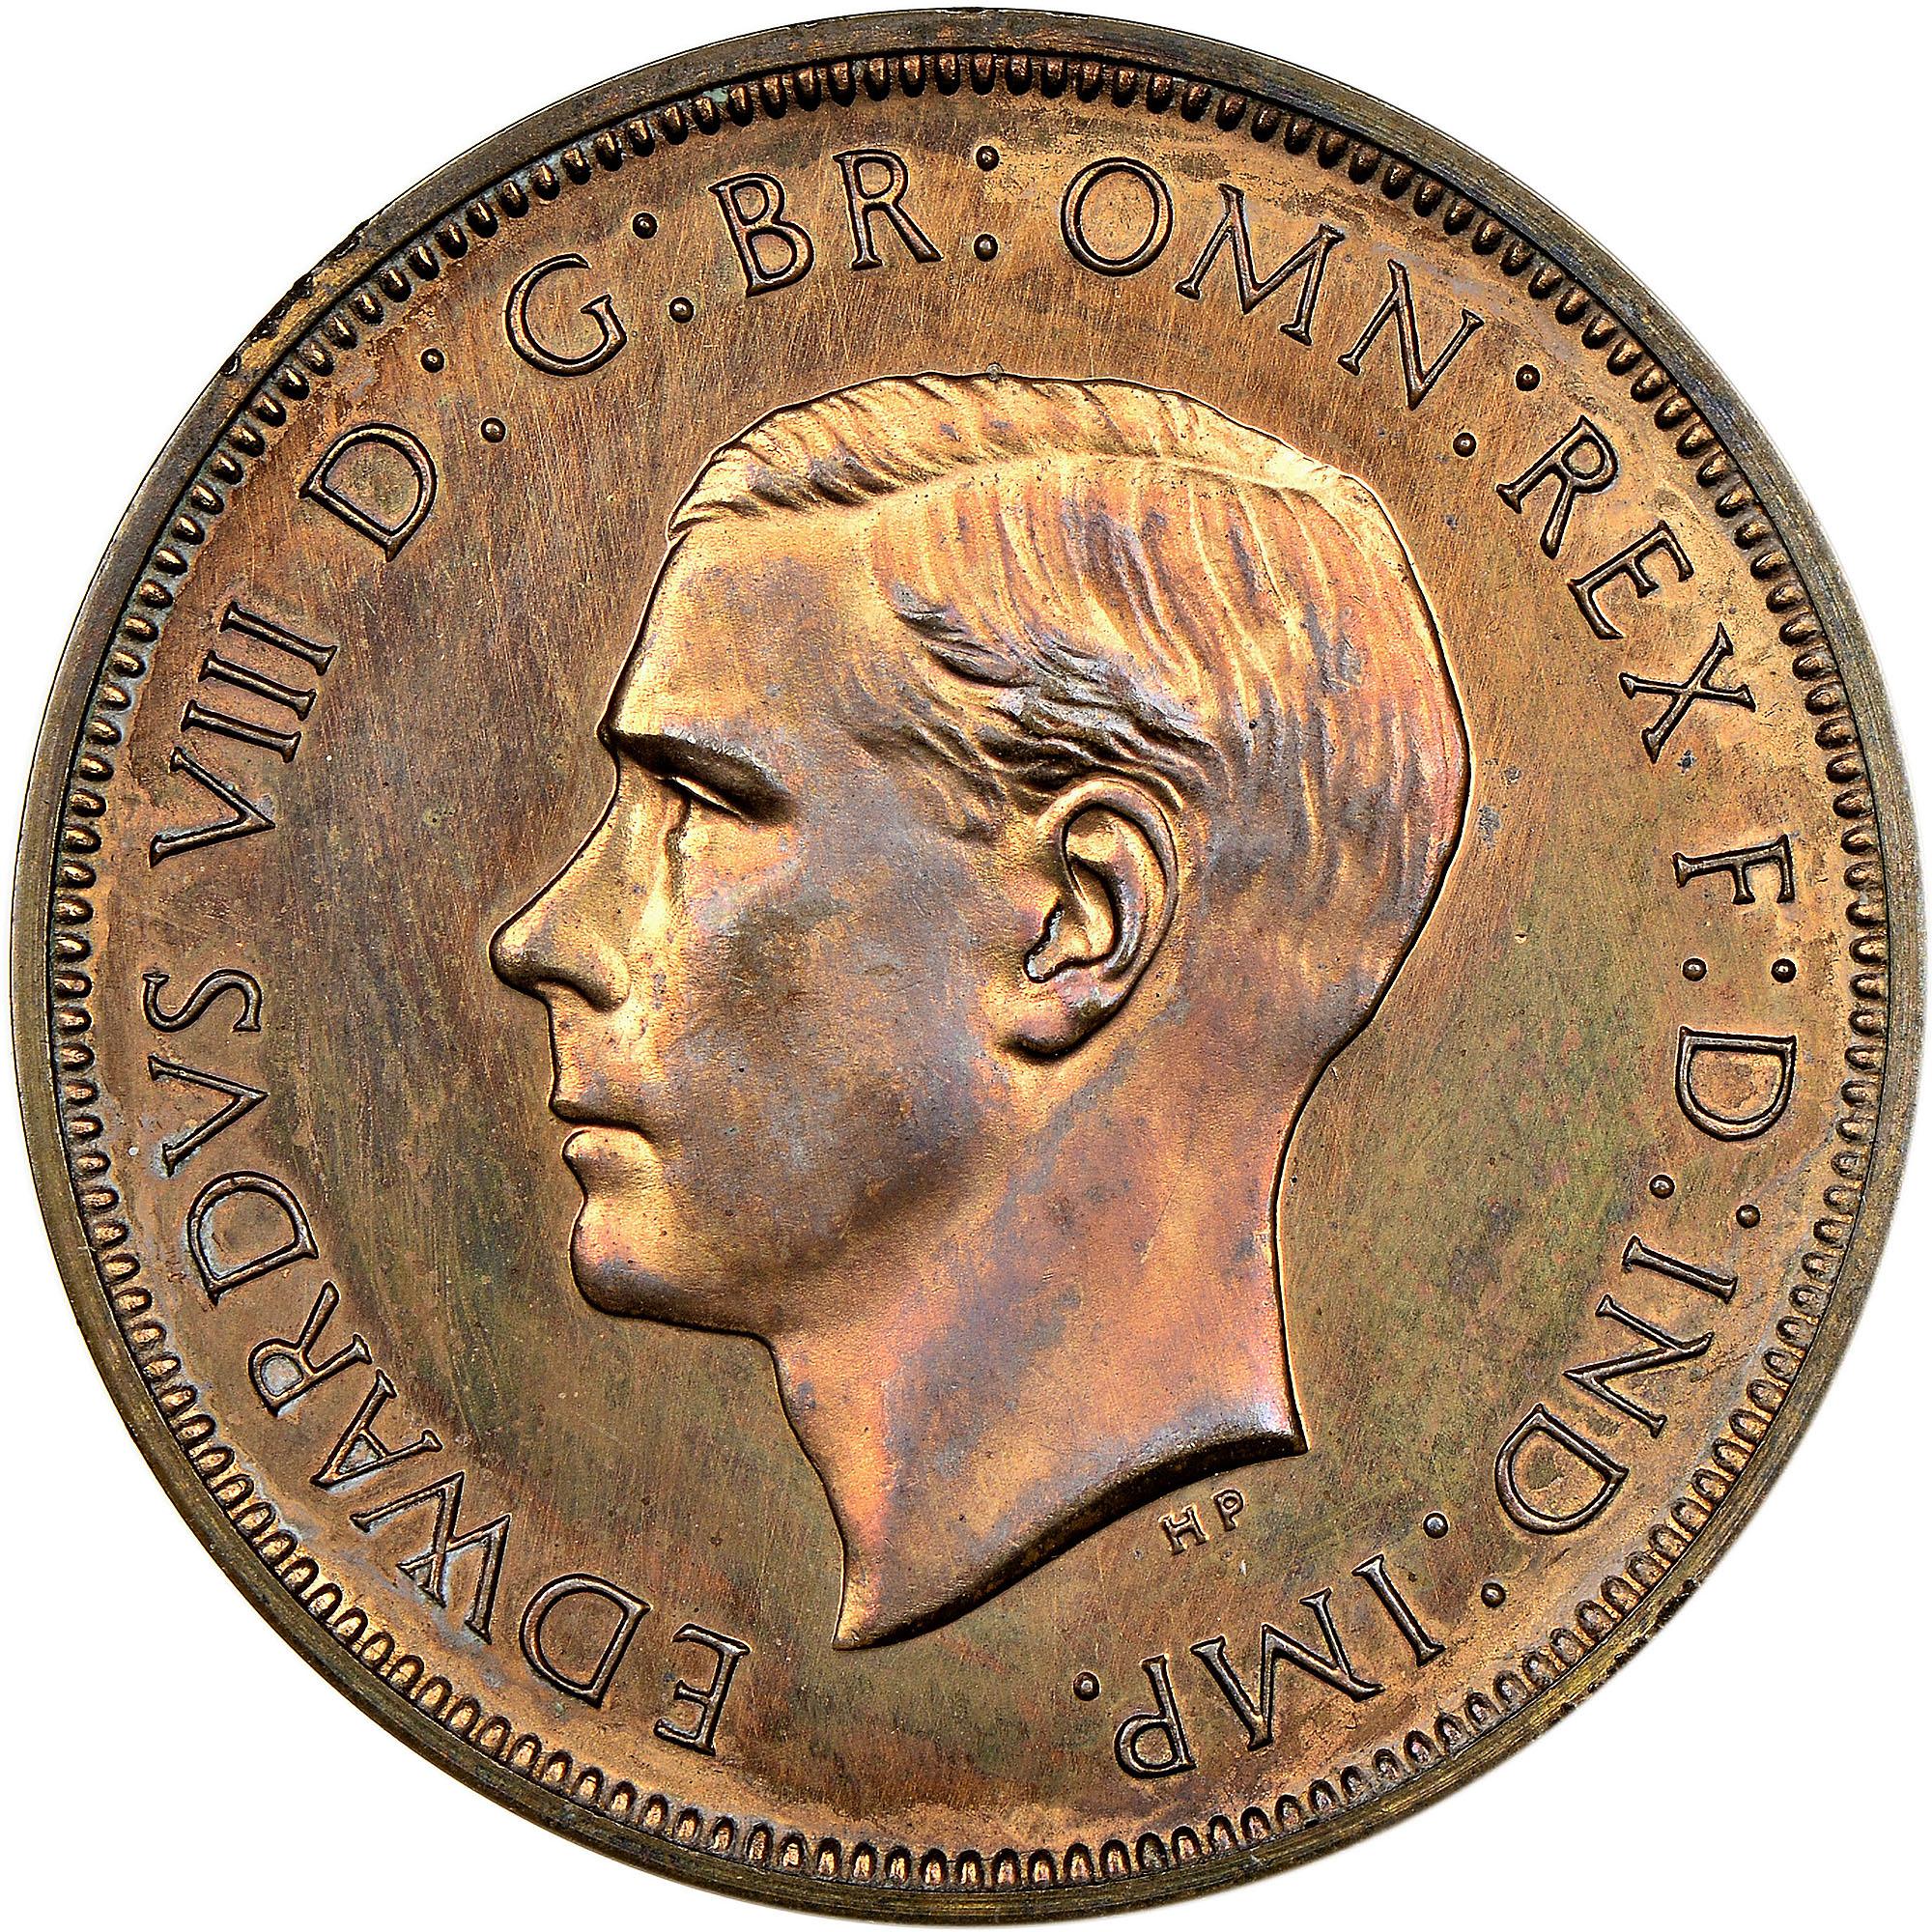 1937 UK Great Britain Penny